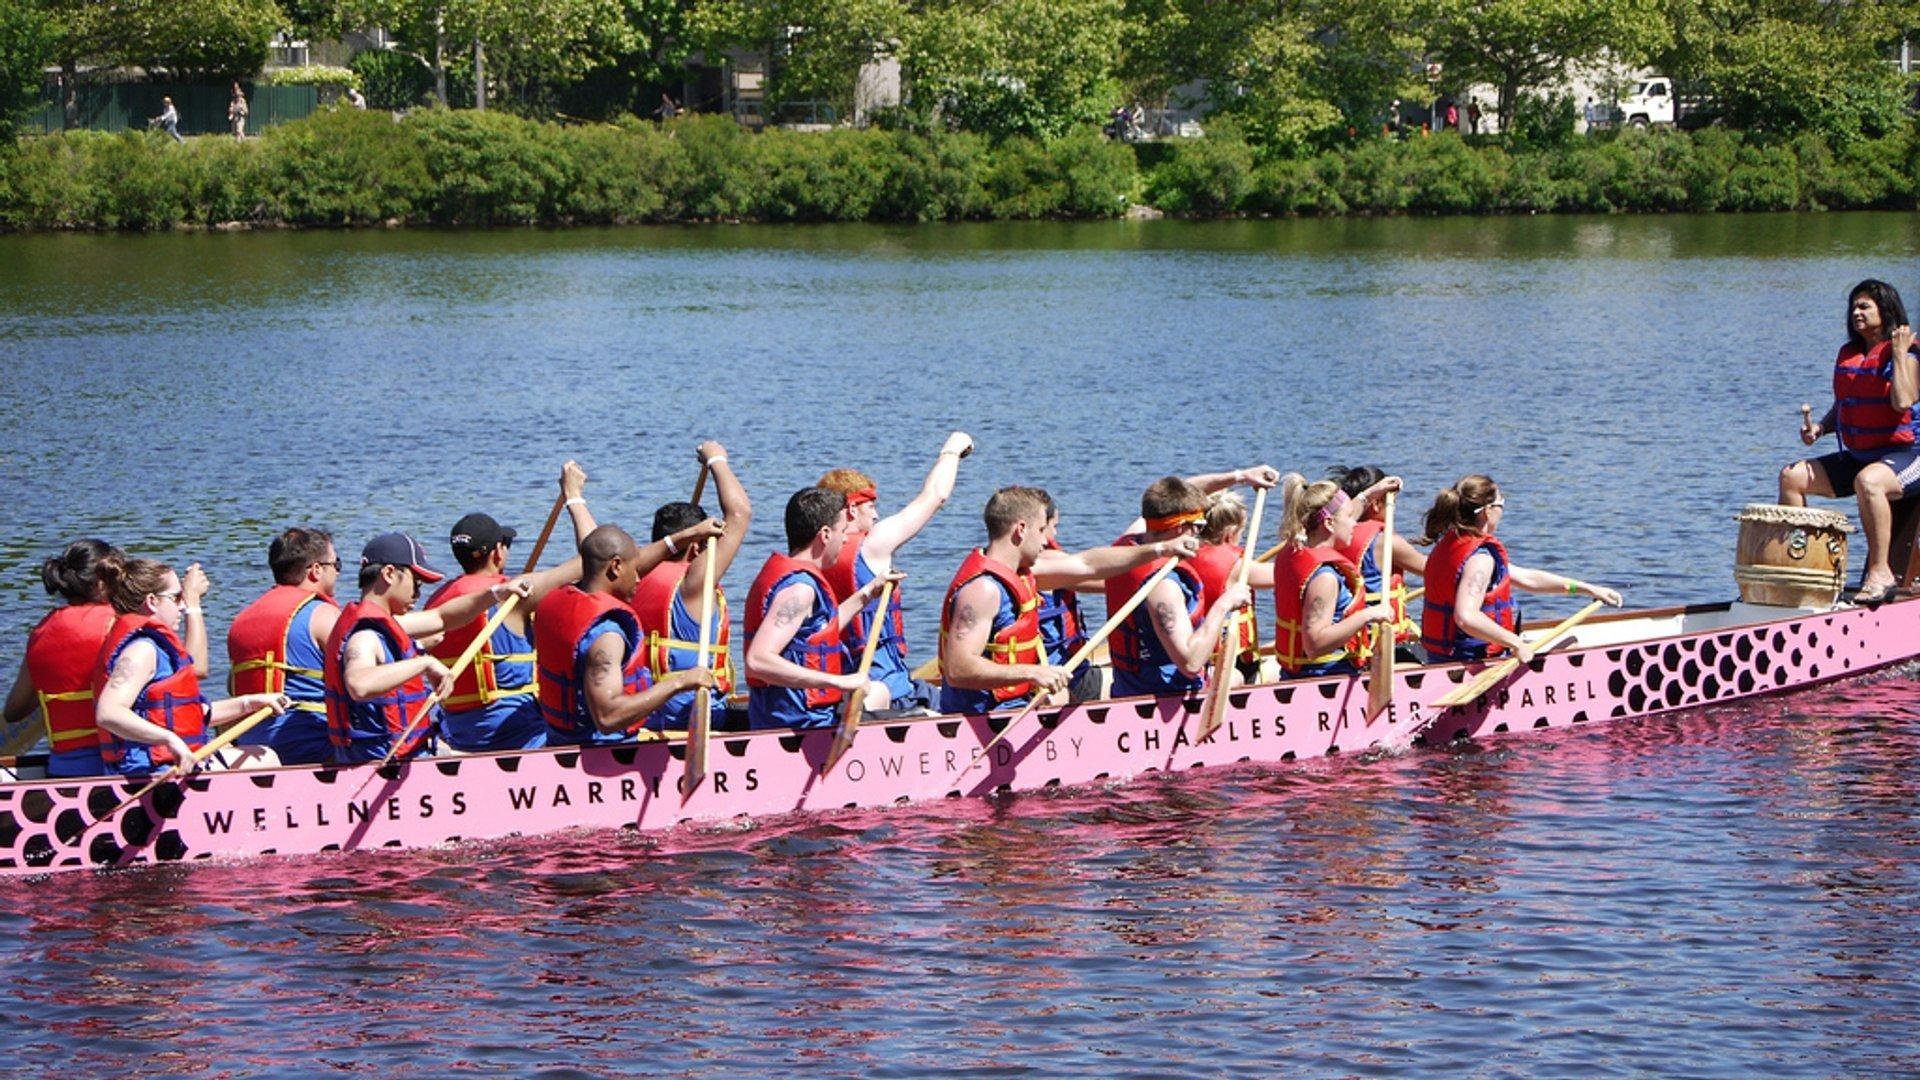 Boston Dragon Boat Festival in Boston 2019 - Best Time